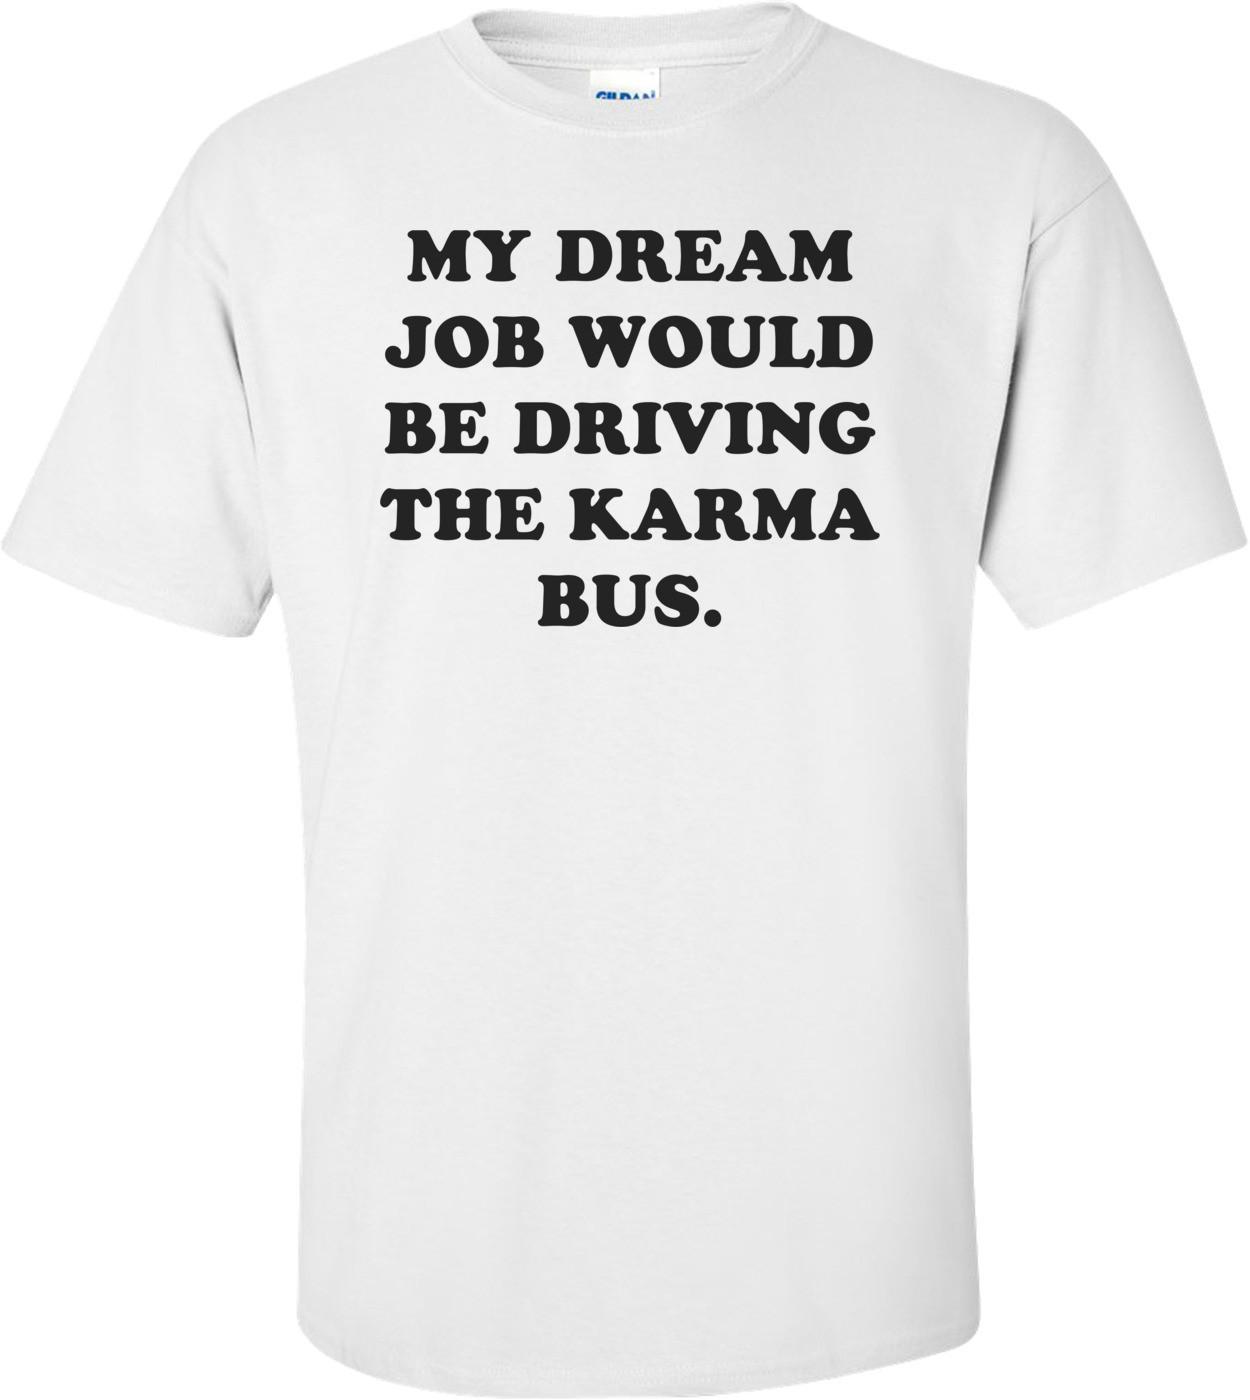 MY DREAM JOB WOULD BE DRIVING THE KARMA BUS. Shirt